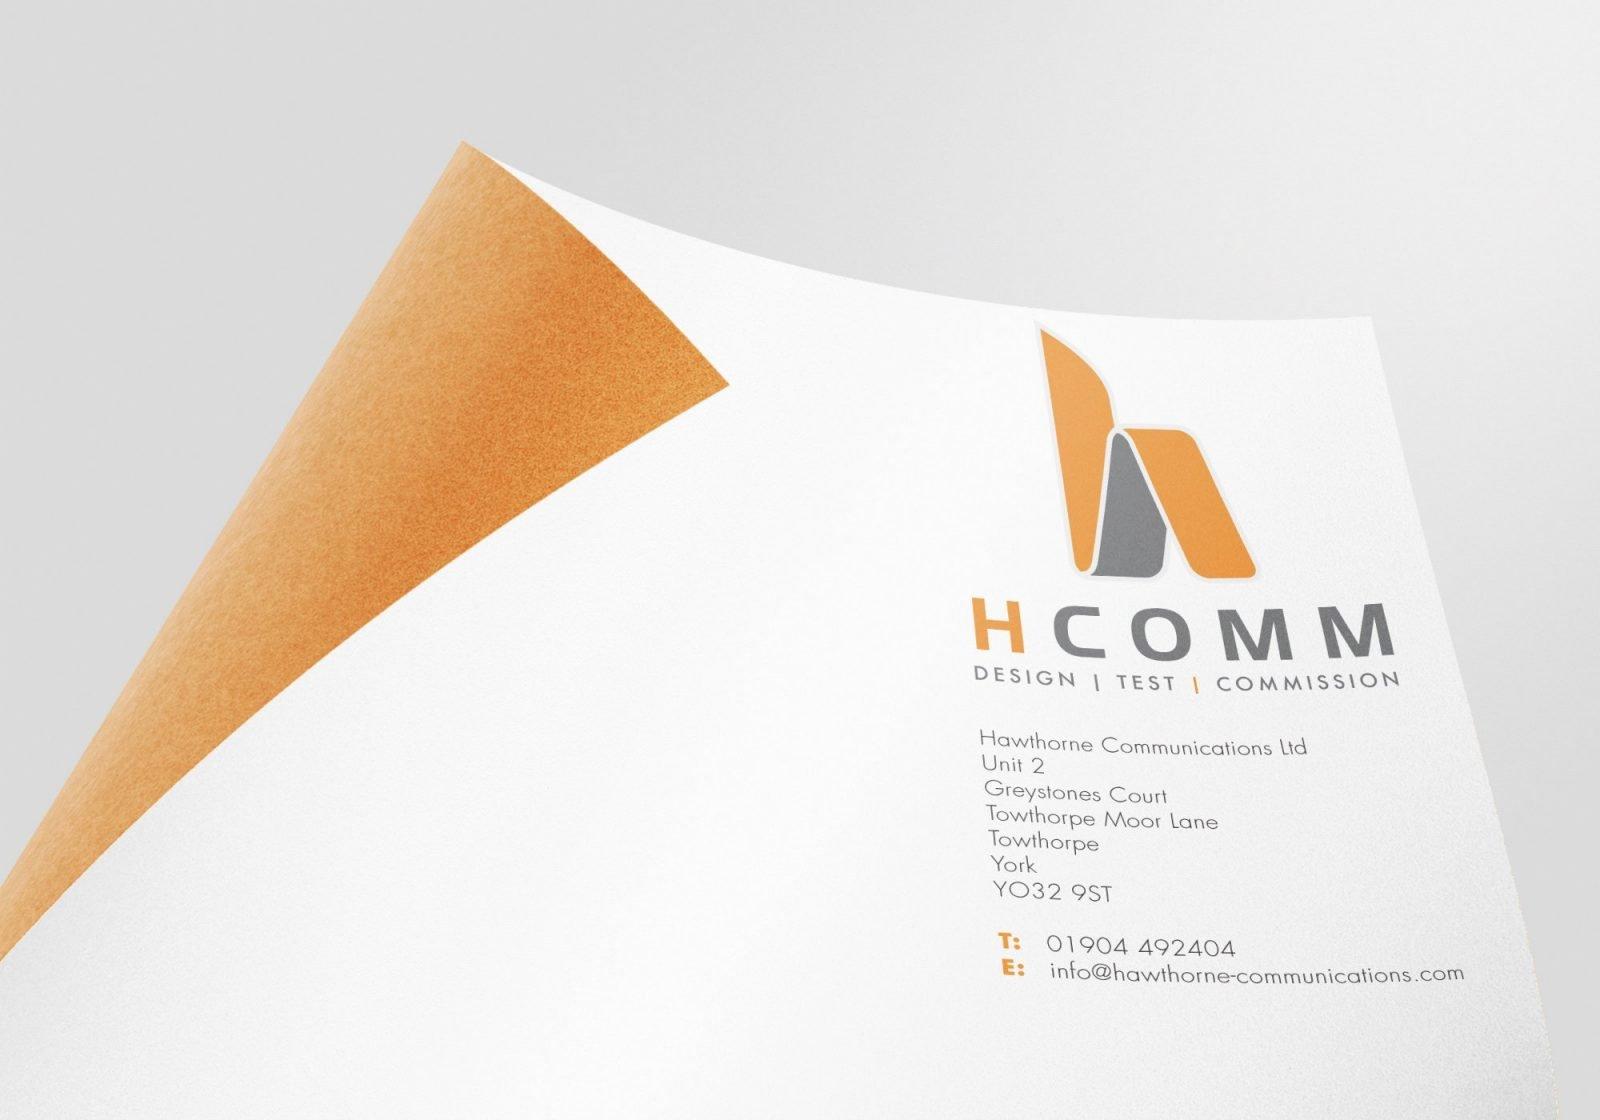 A logo close up on paper showing Hcomm Rail's logo design